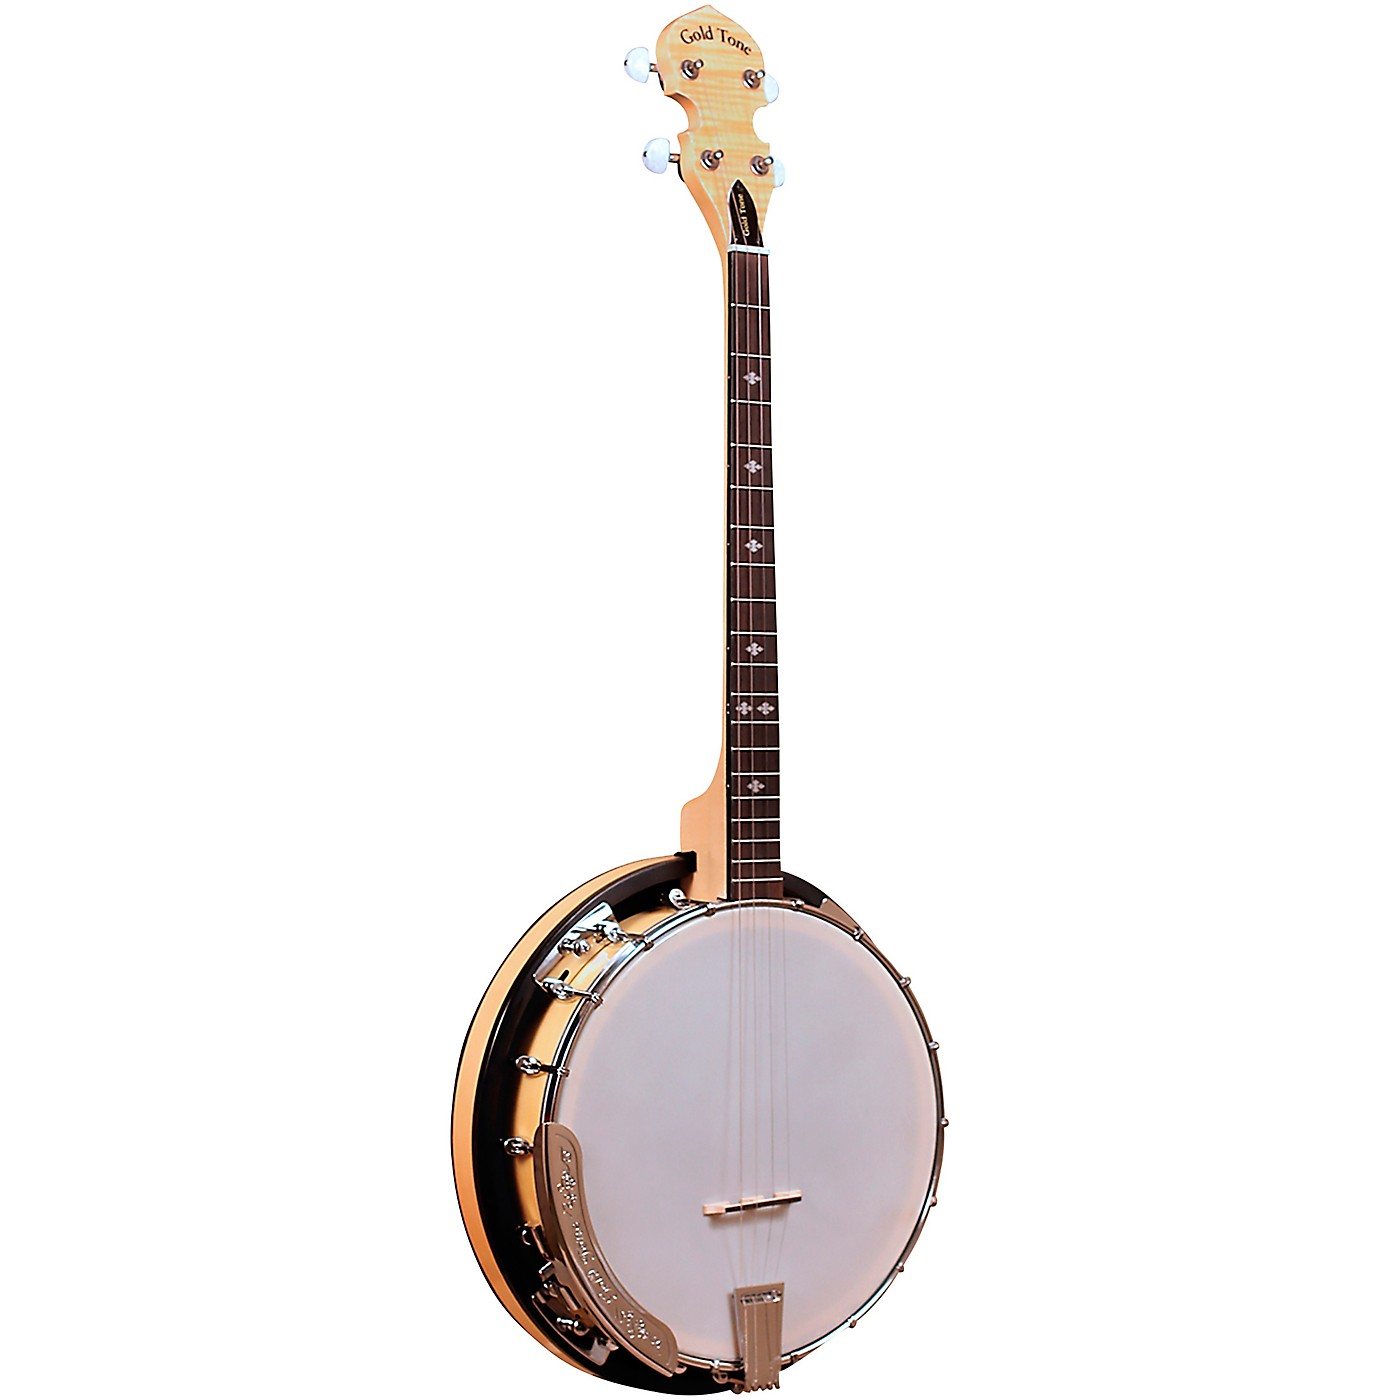 Gold Tone Cripple Creek Left-Handed Tenor Banjo thumbnail